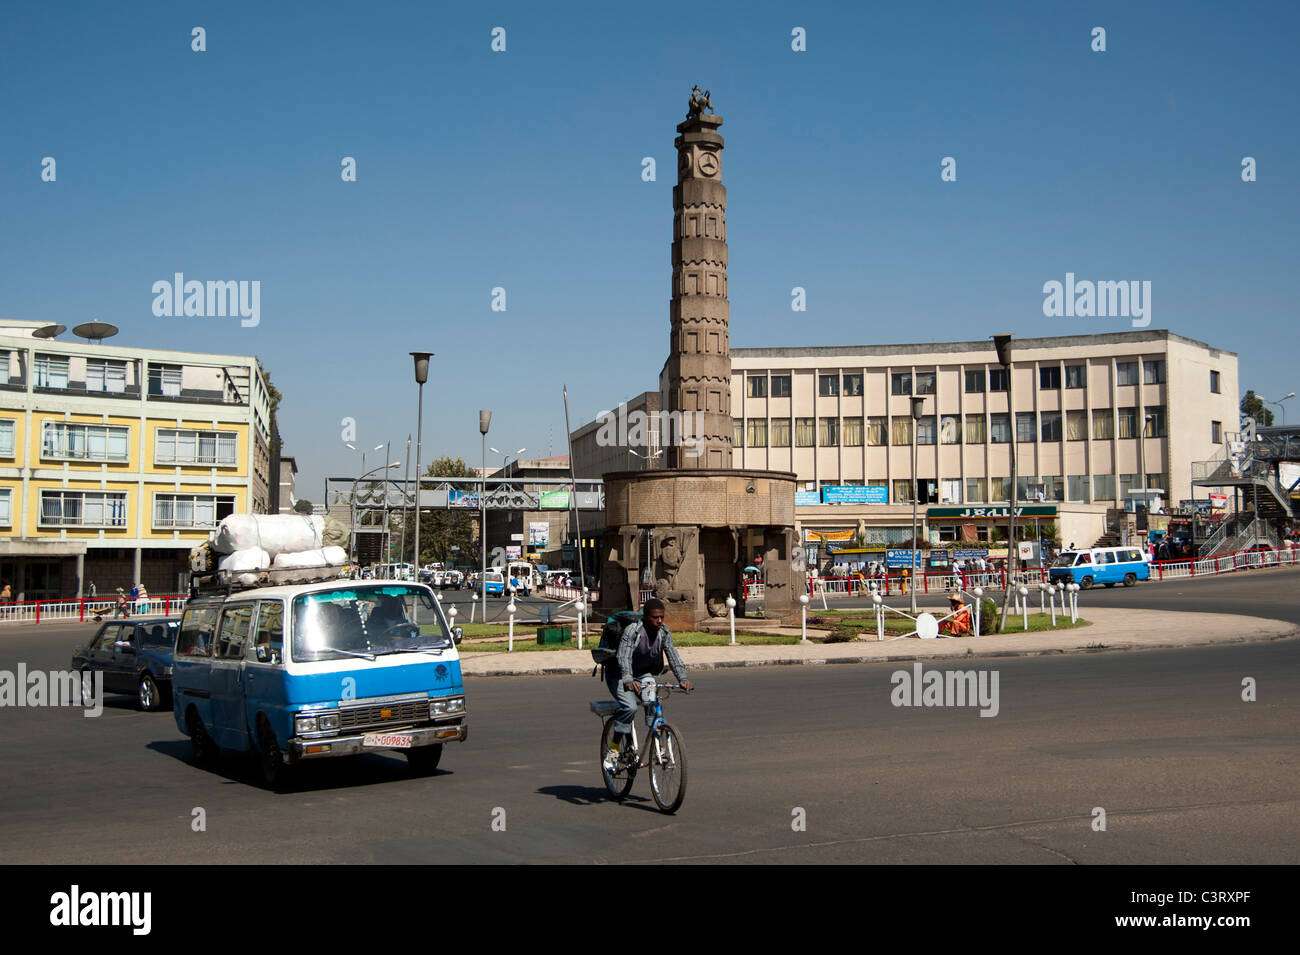 Arat Kilo, Meyazia 27 Square, Addis Ababa, Ethiopia - Stock Image